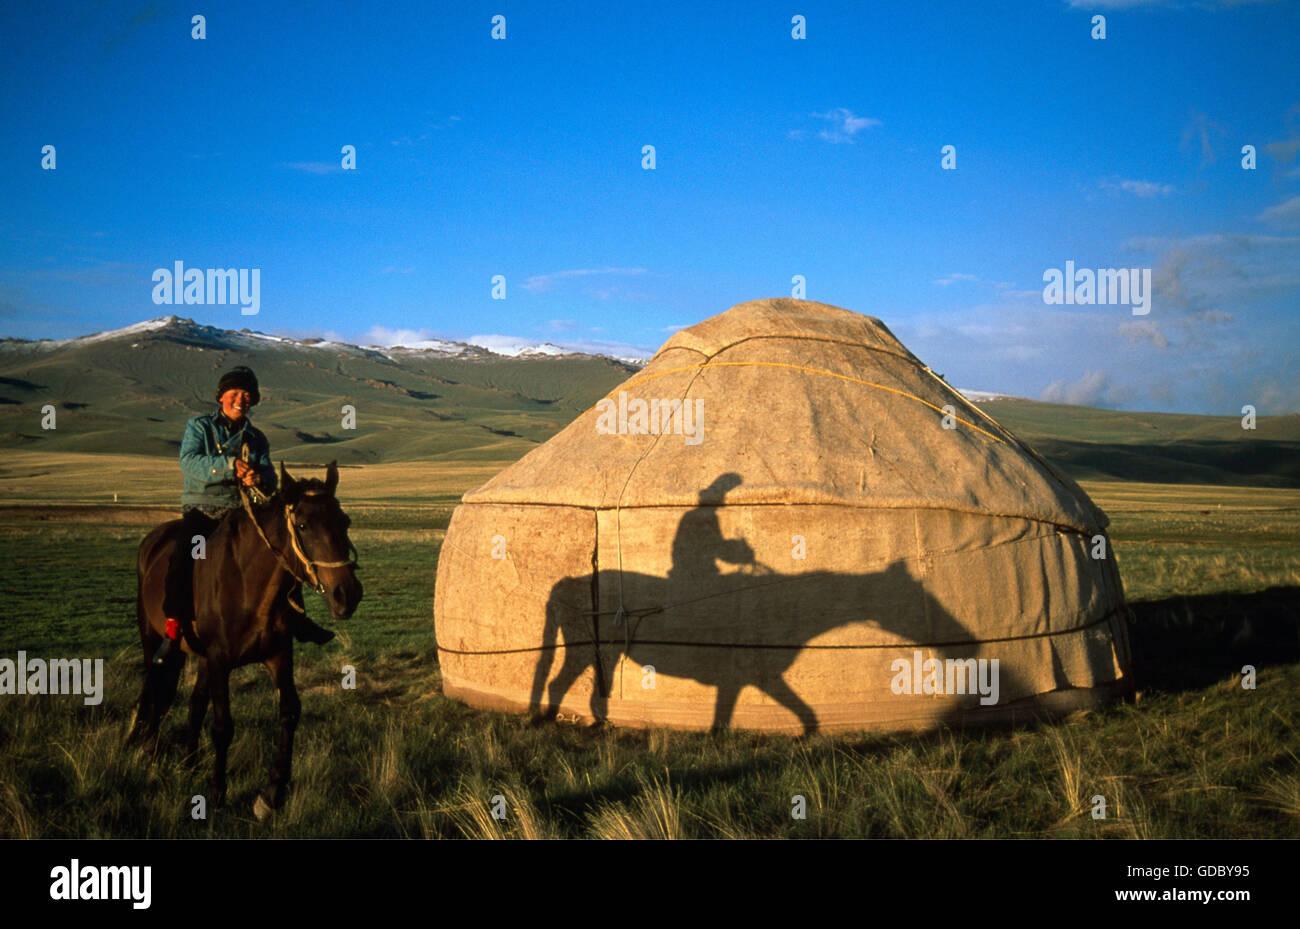 Pilota davanti di un tipico yurt, Moldo troppo gamma, Lago Song-Kul, Kirgizia Foto Stock